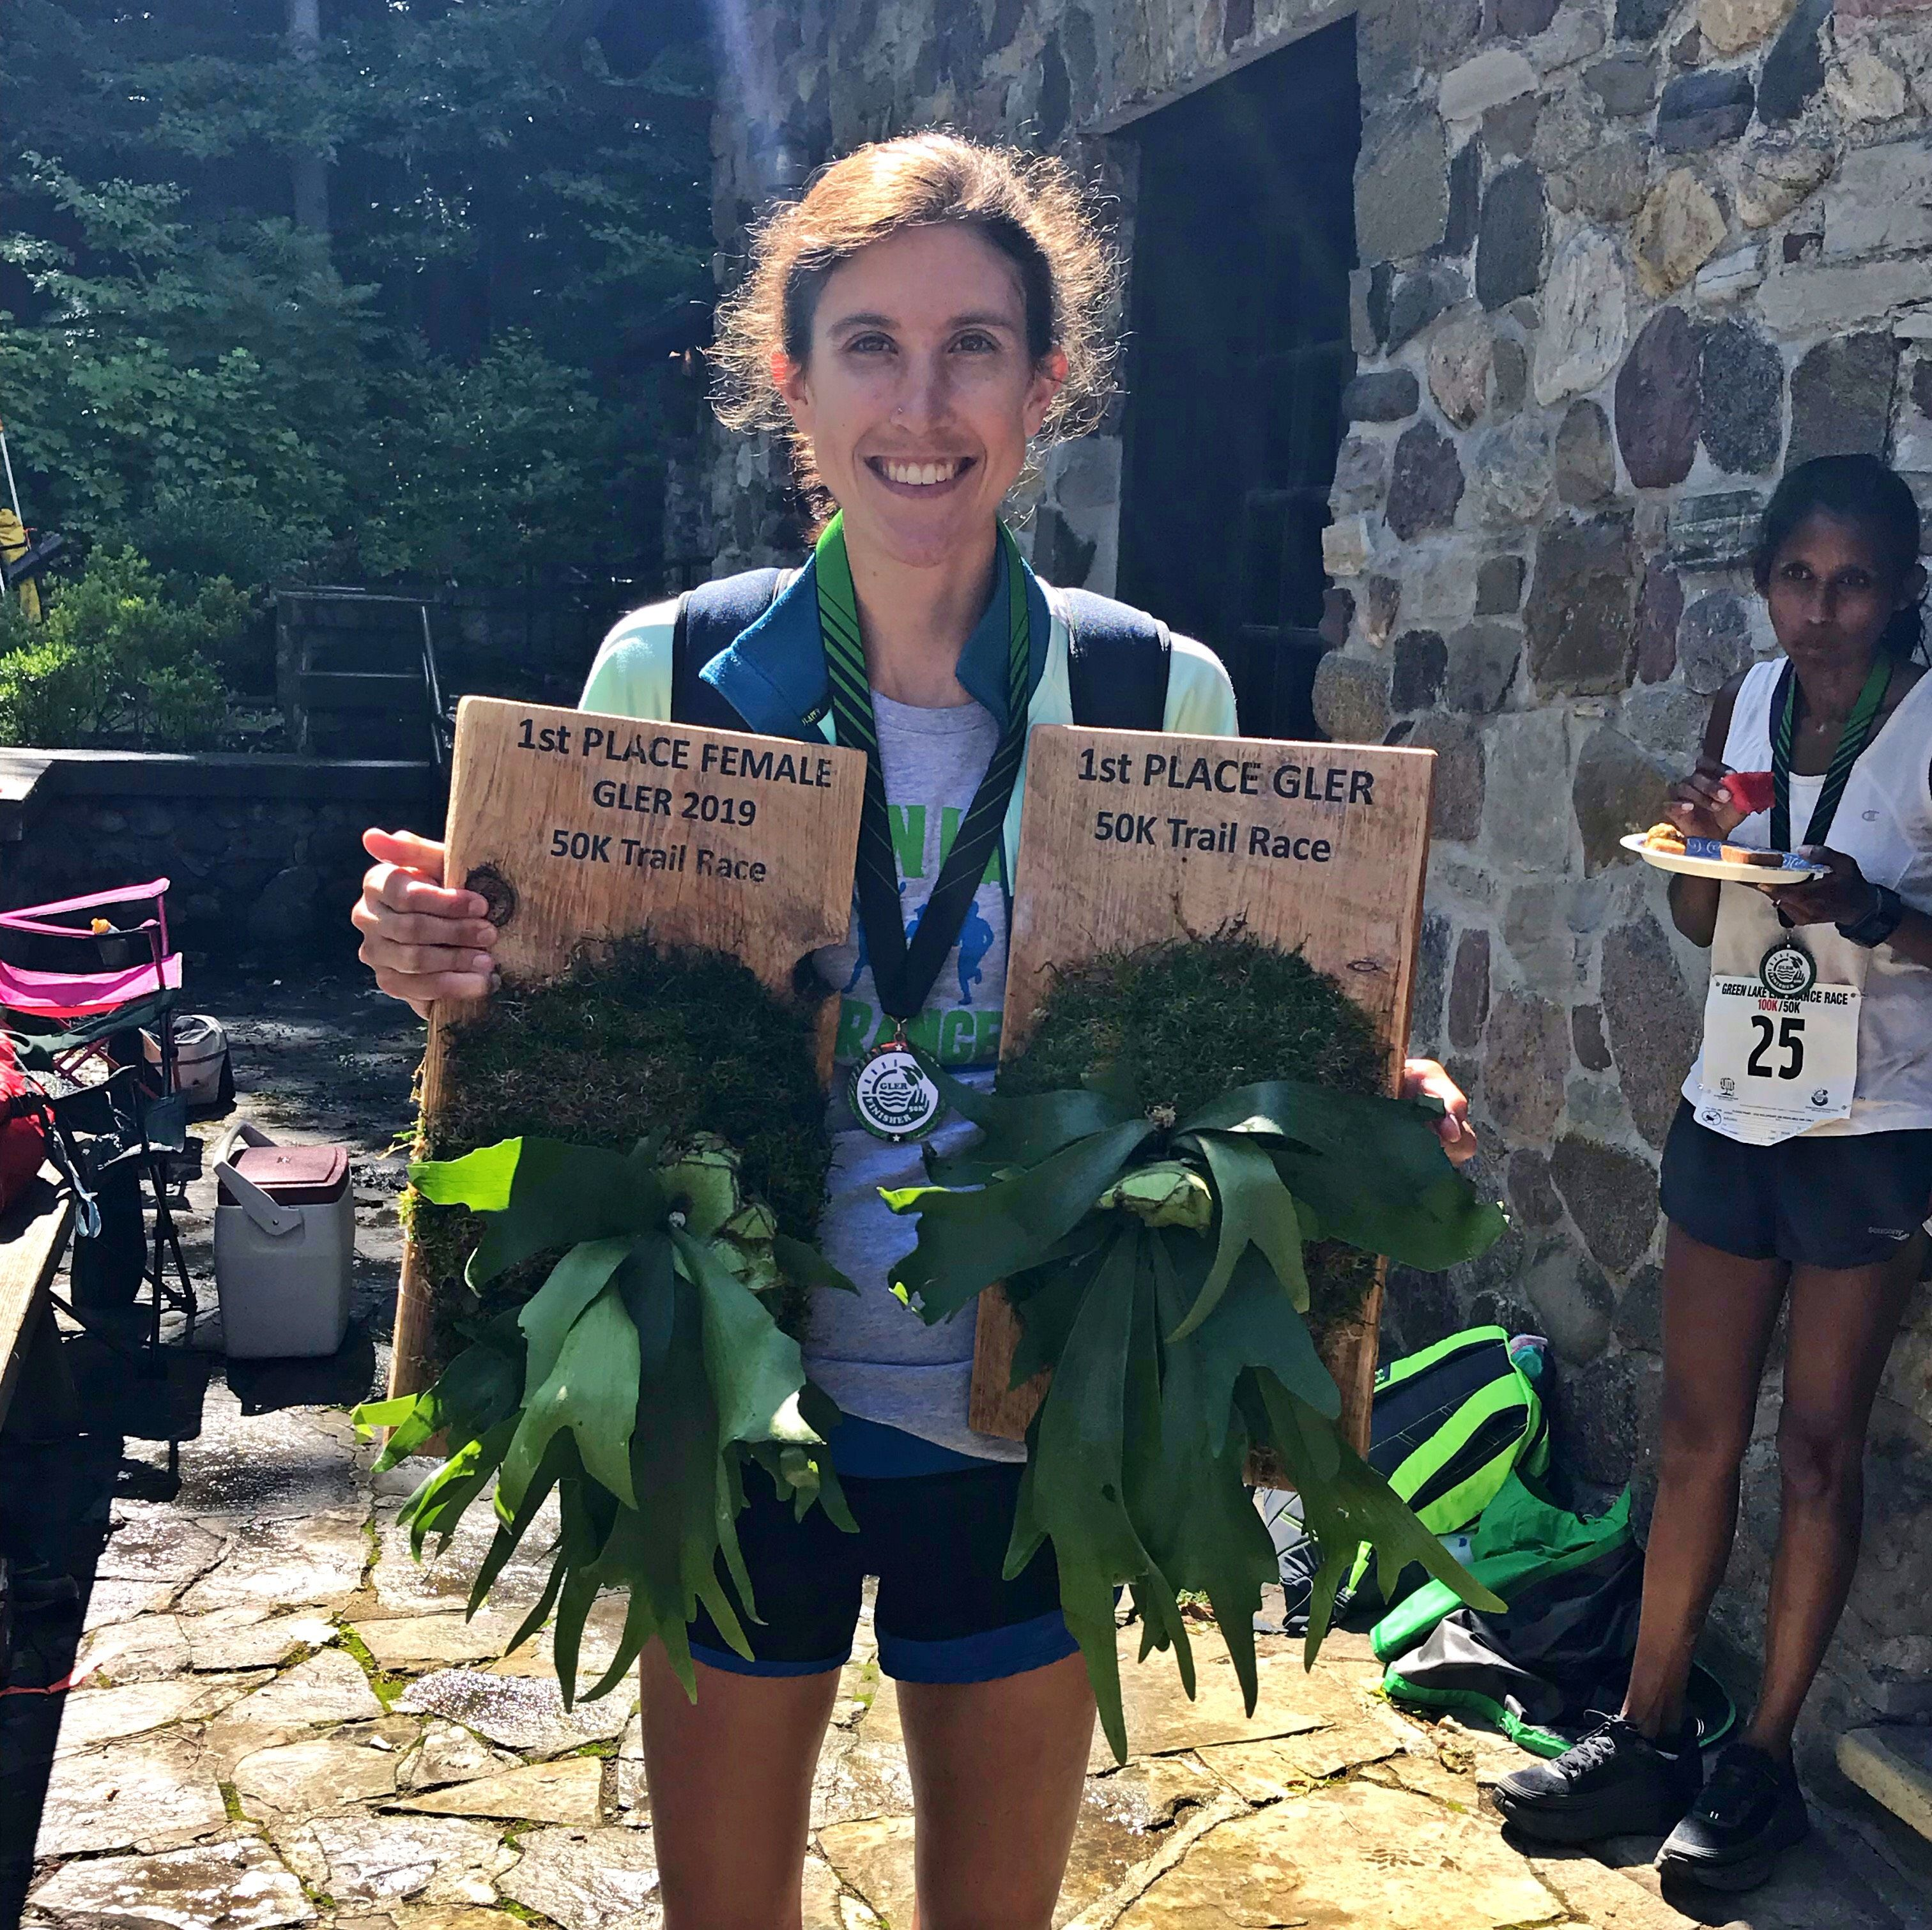 Woman Wins 50K Ultra Outright, Trophy Snafu for Male Winner Follows